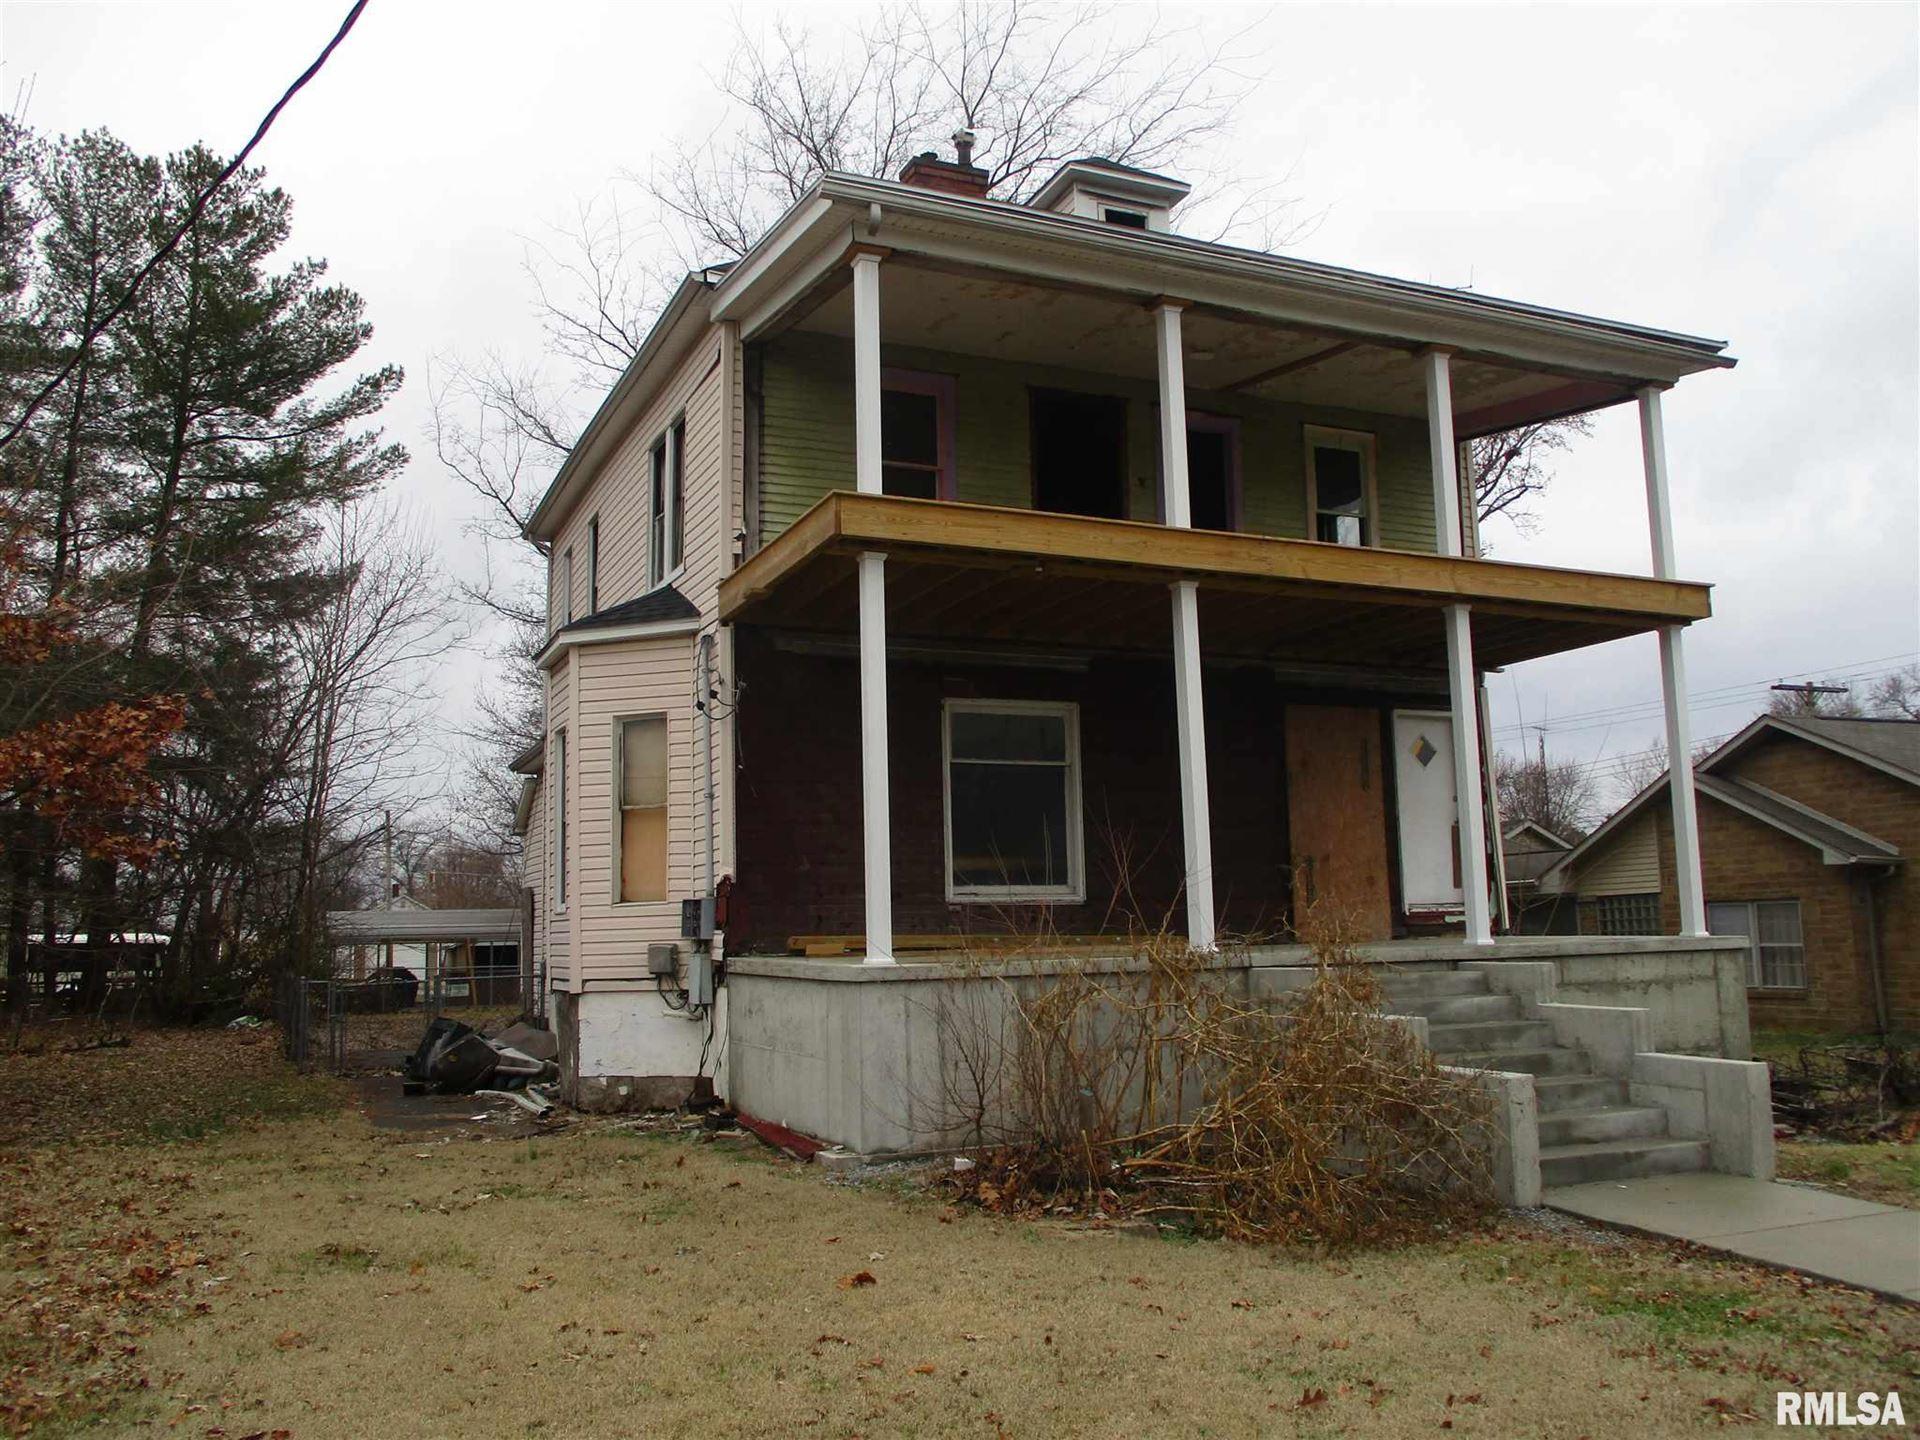 105 MILL, Benton, IL 62812-0000 - MLS#: EB435193